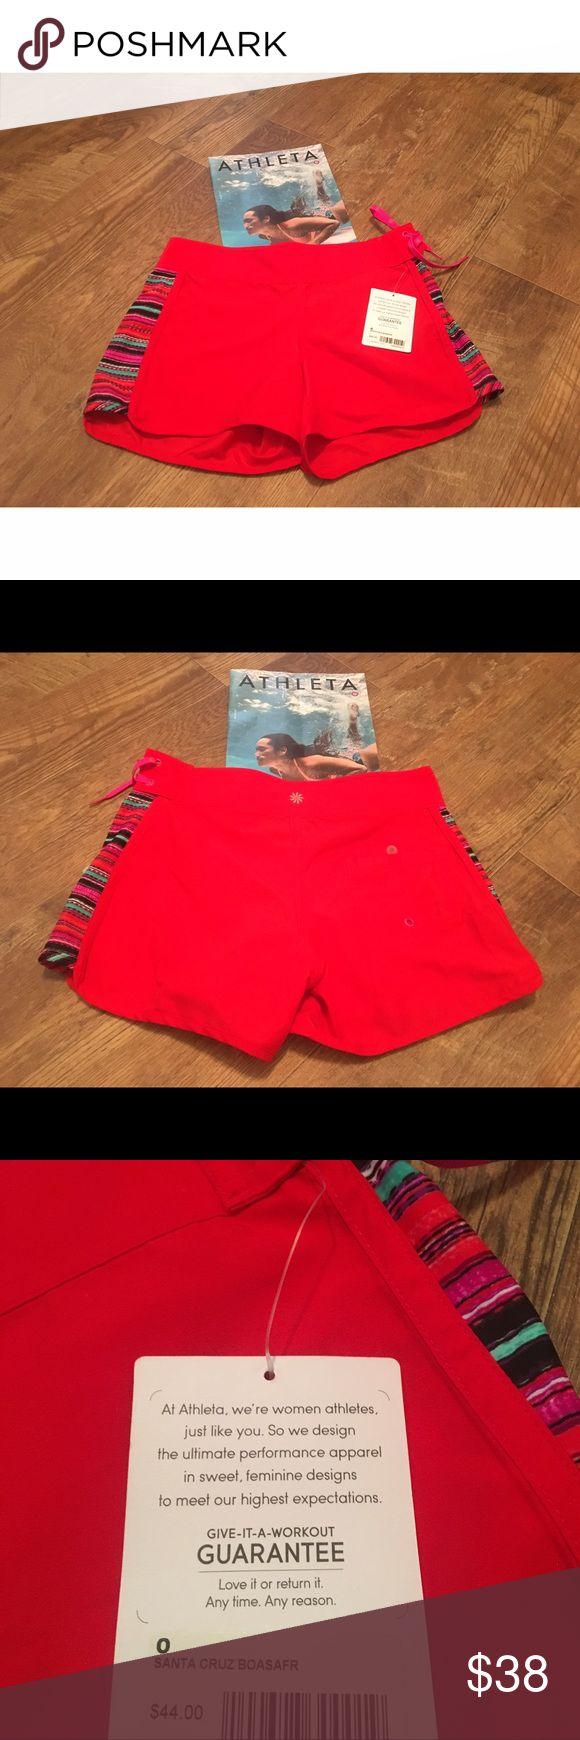 NWT ✨ Red Athleta Shorts Women's Red Athleta Shorts - Size 0 Athleta Shorts